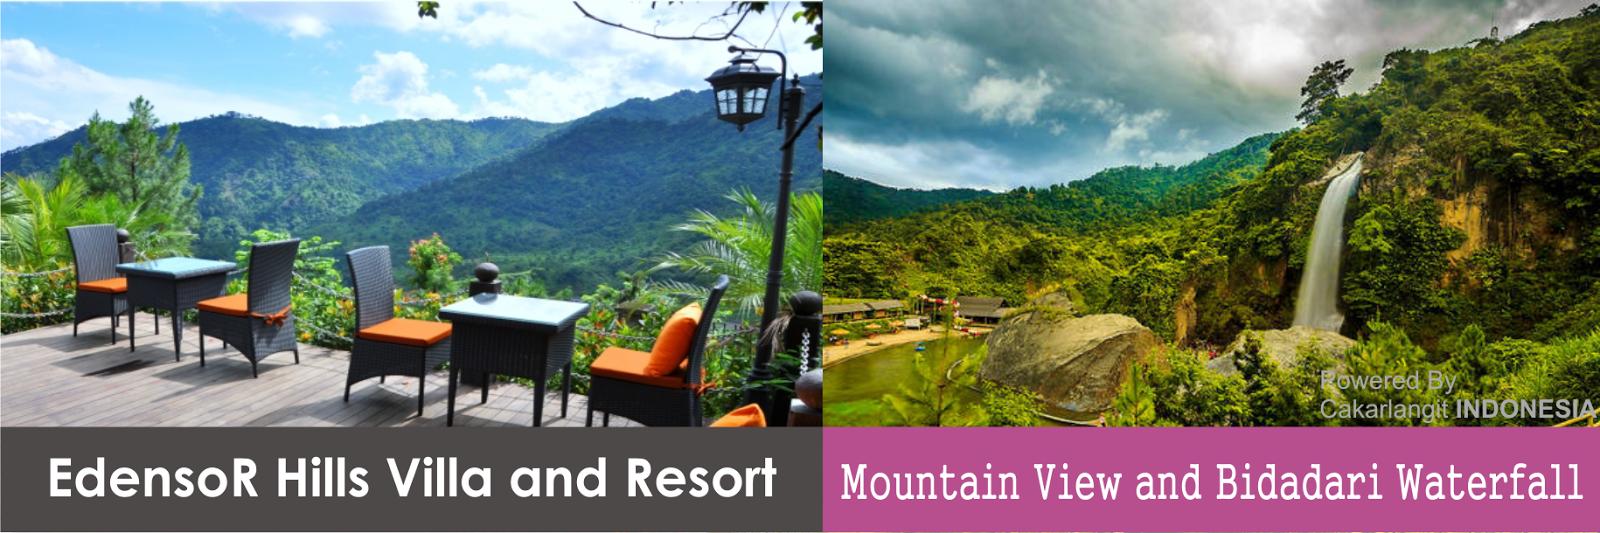 Edensor Hills VILLA  RESORT SENTUL  Cakar Langit Indonesia